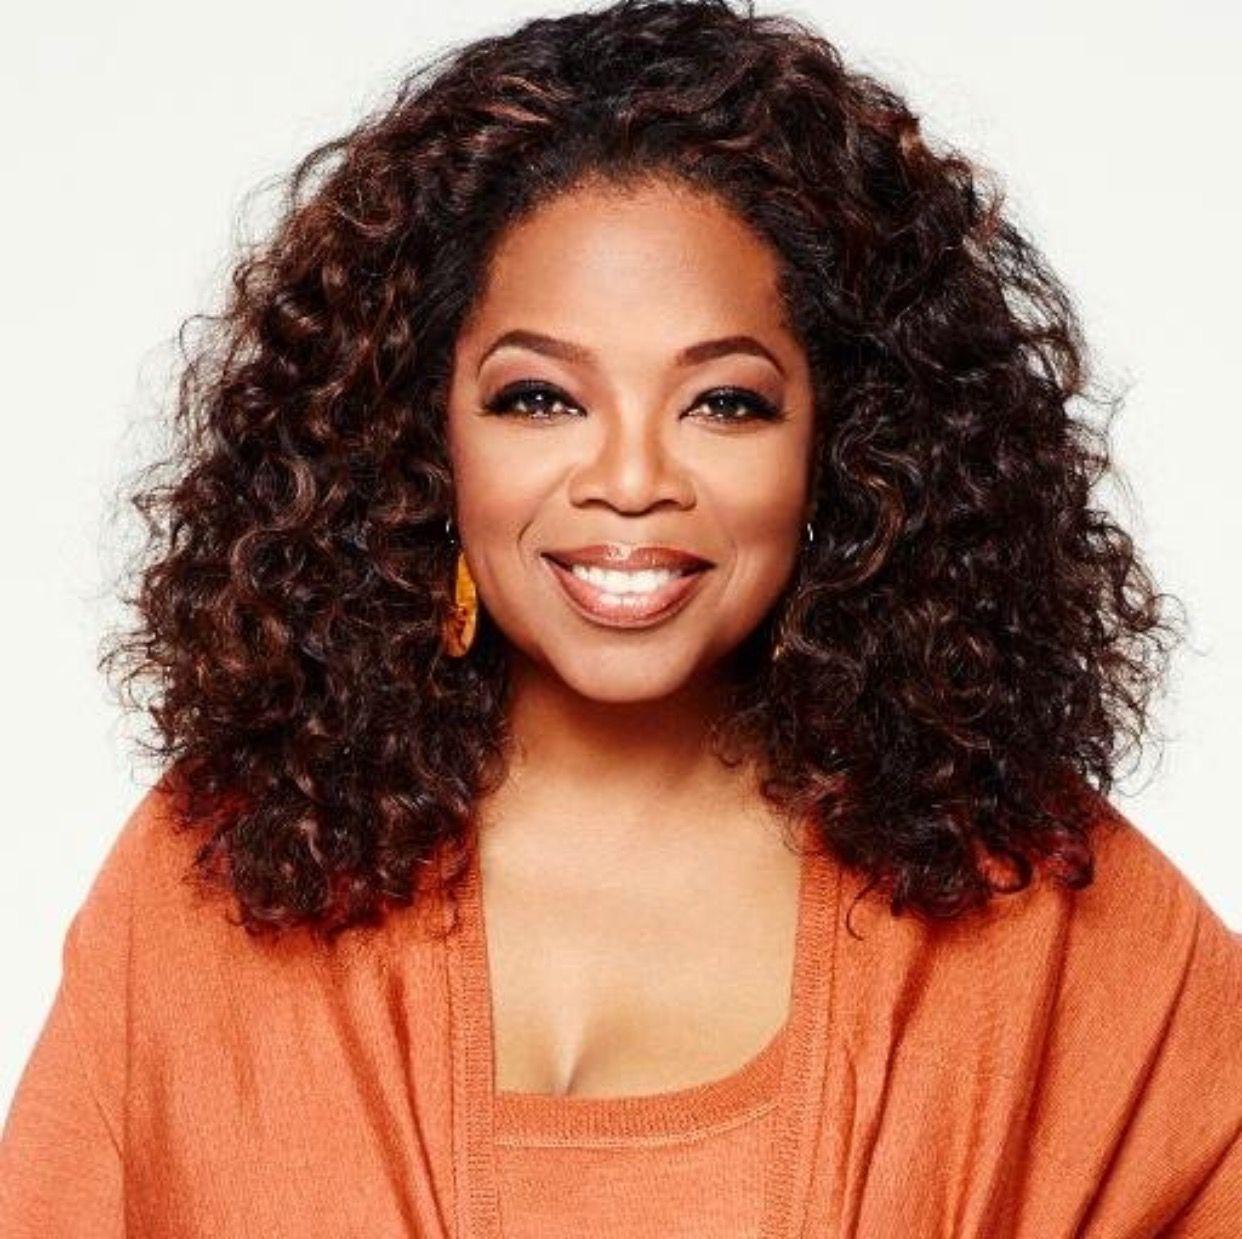 Oprah wedding dresses  Oprah Winfrey B Oprah Winfrey is an American media proprietor